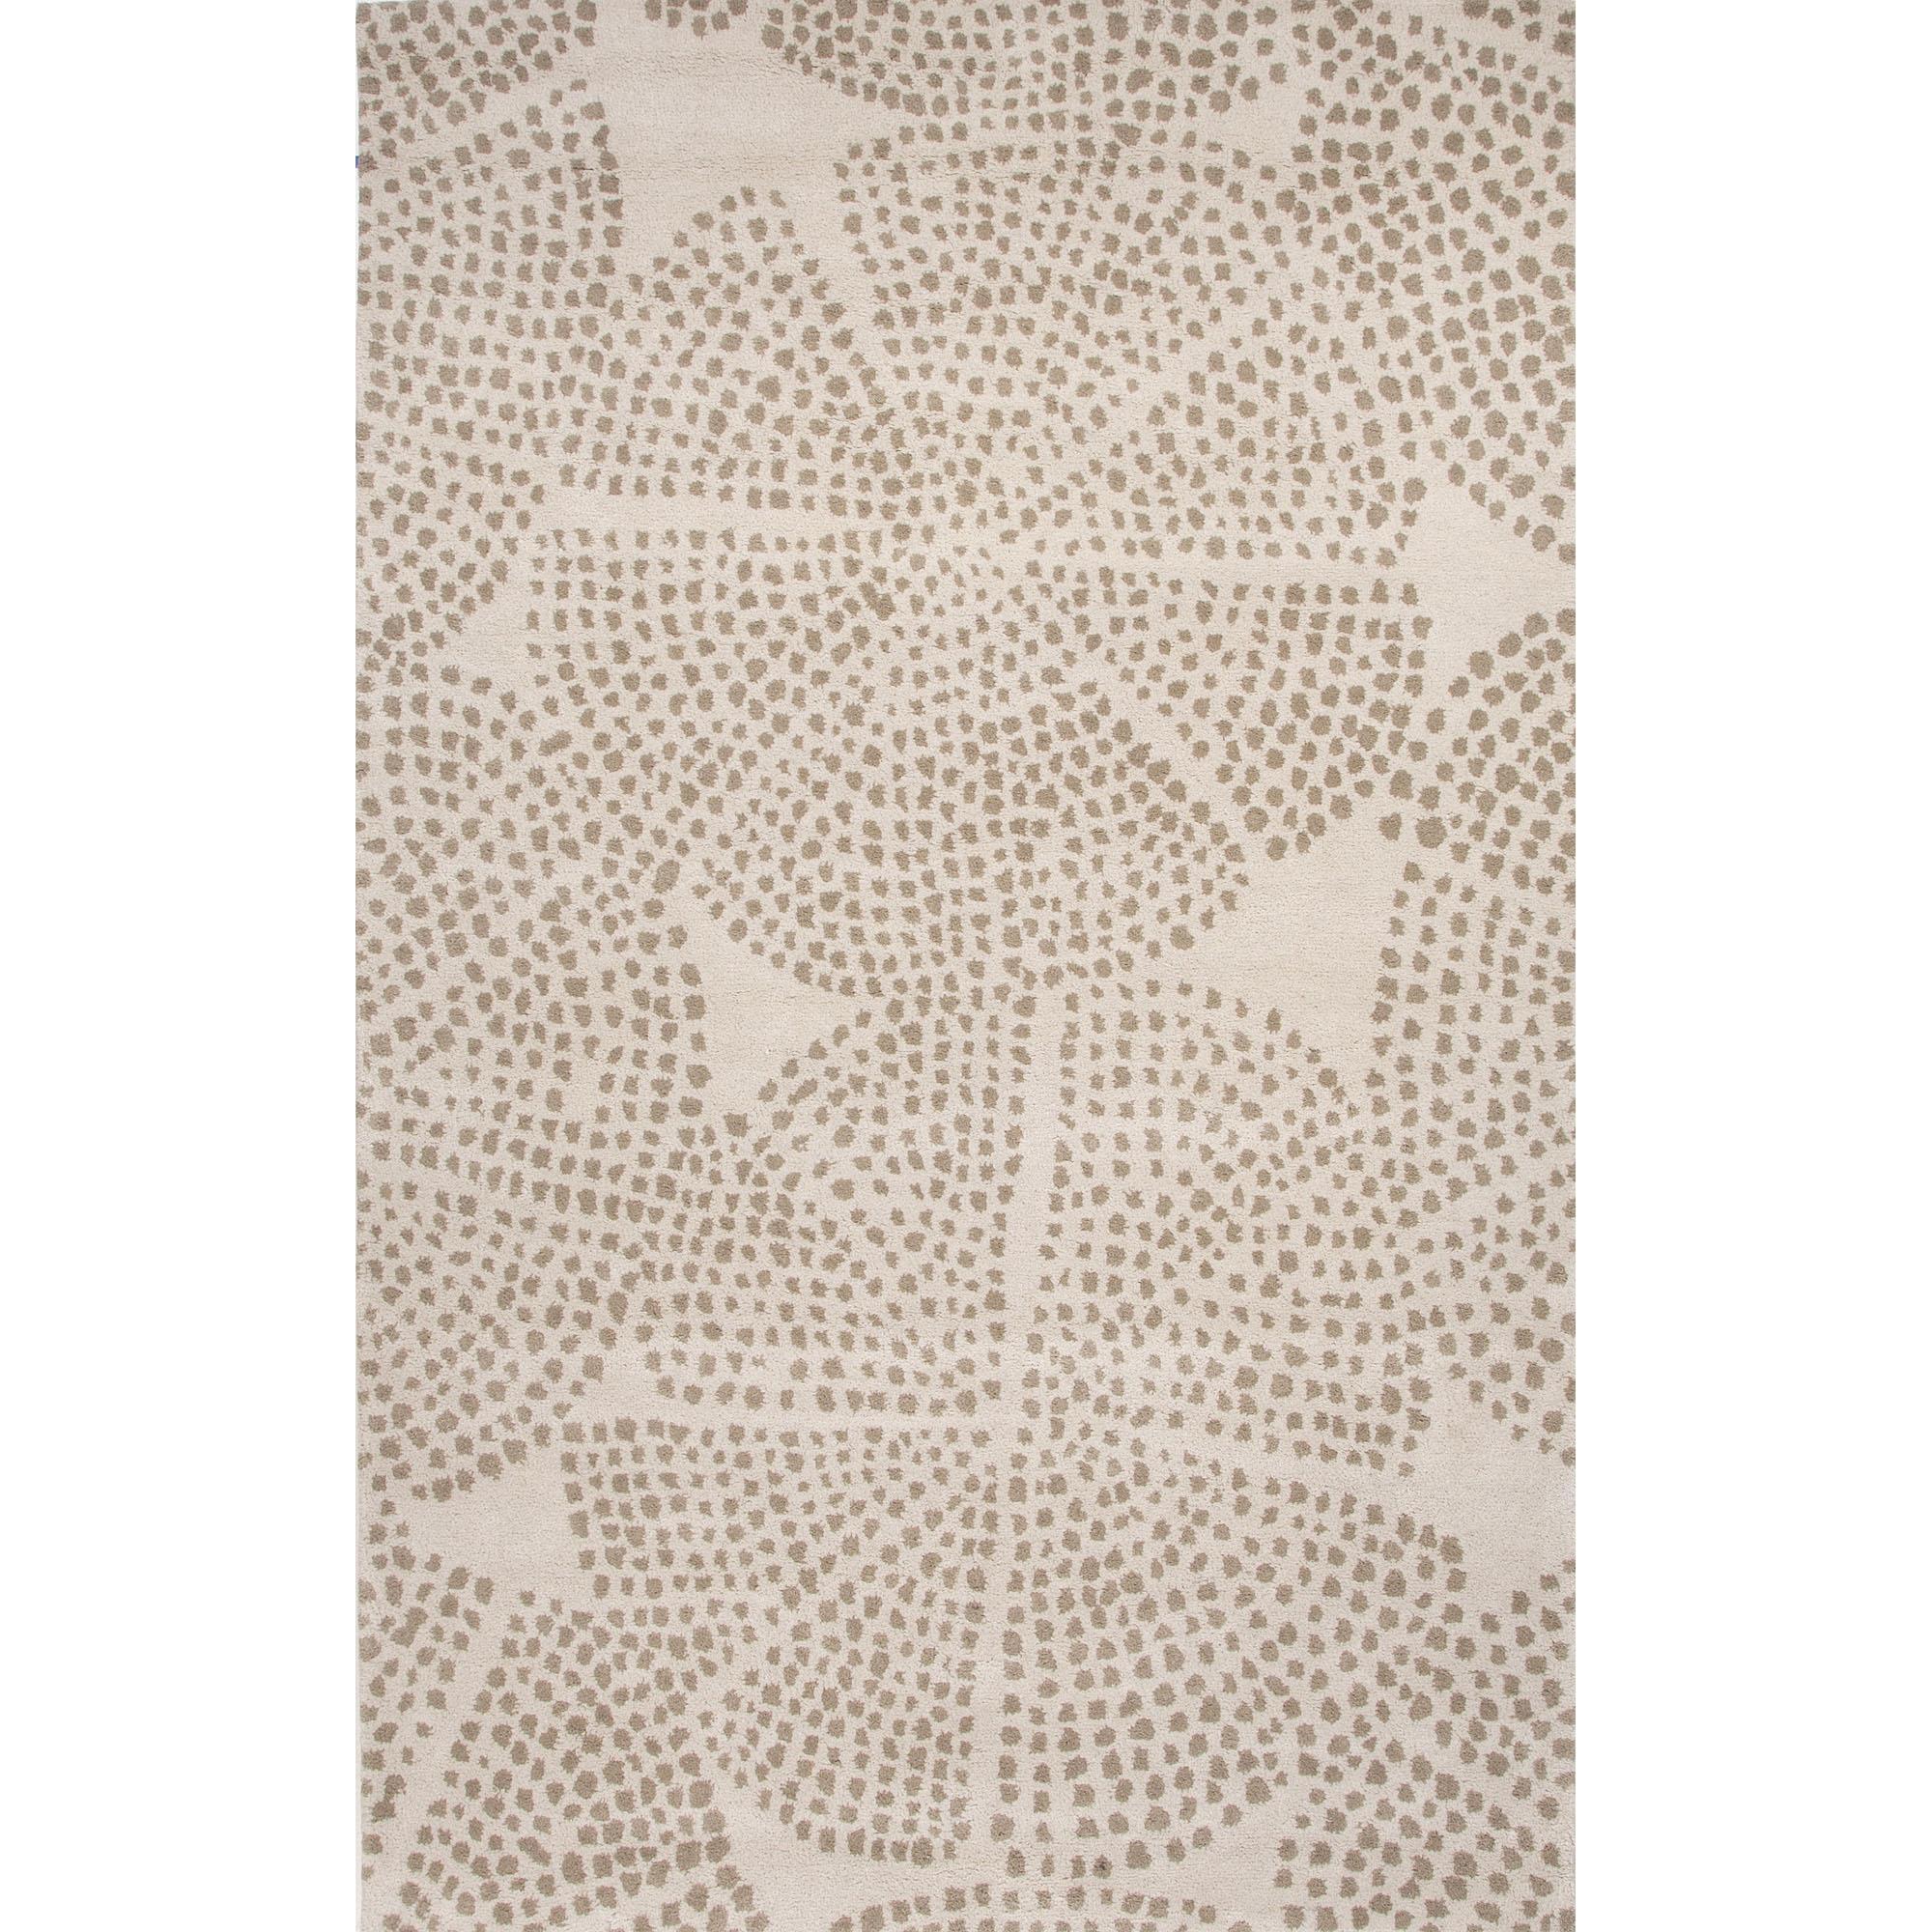 JAIPUR Rugs En Casa By Luli Sanchez Tufted 5 x 8 Rug - Item Number: RUG116054